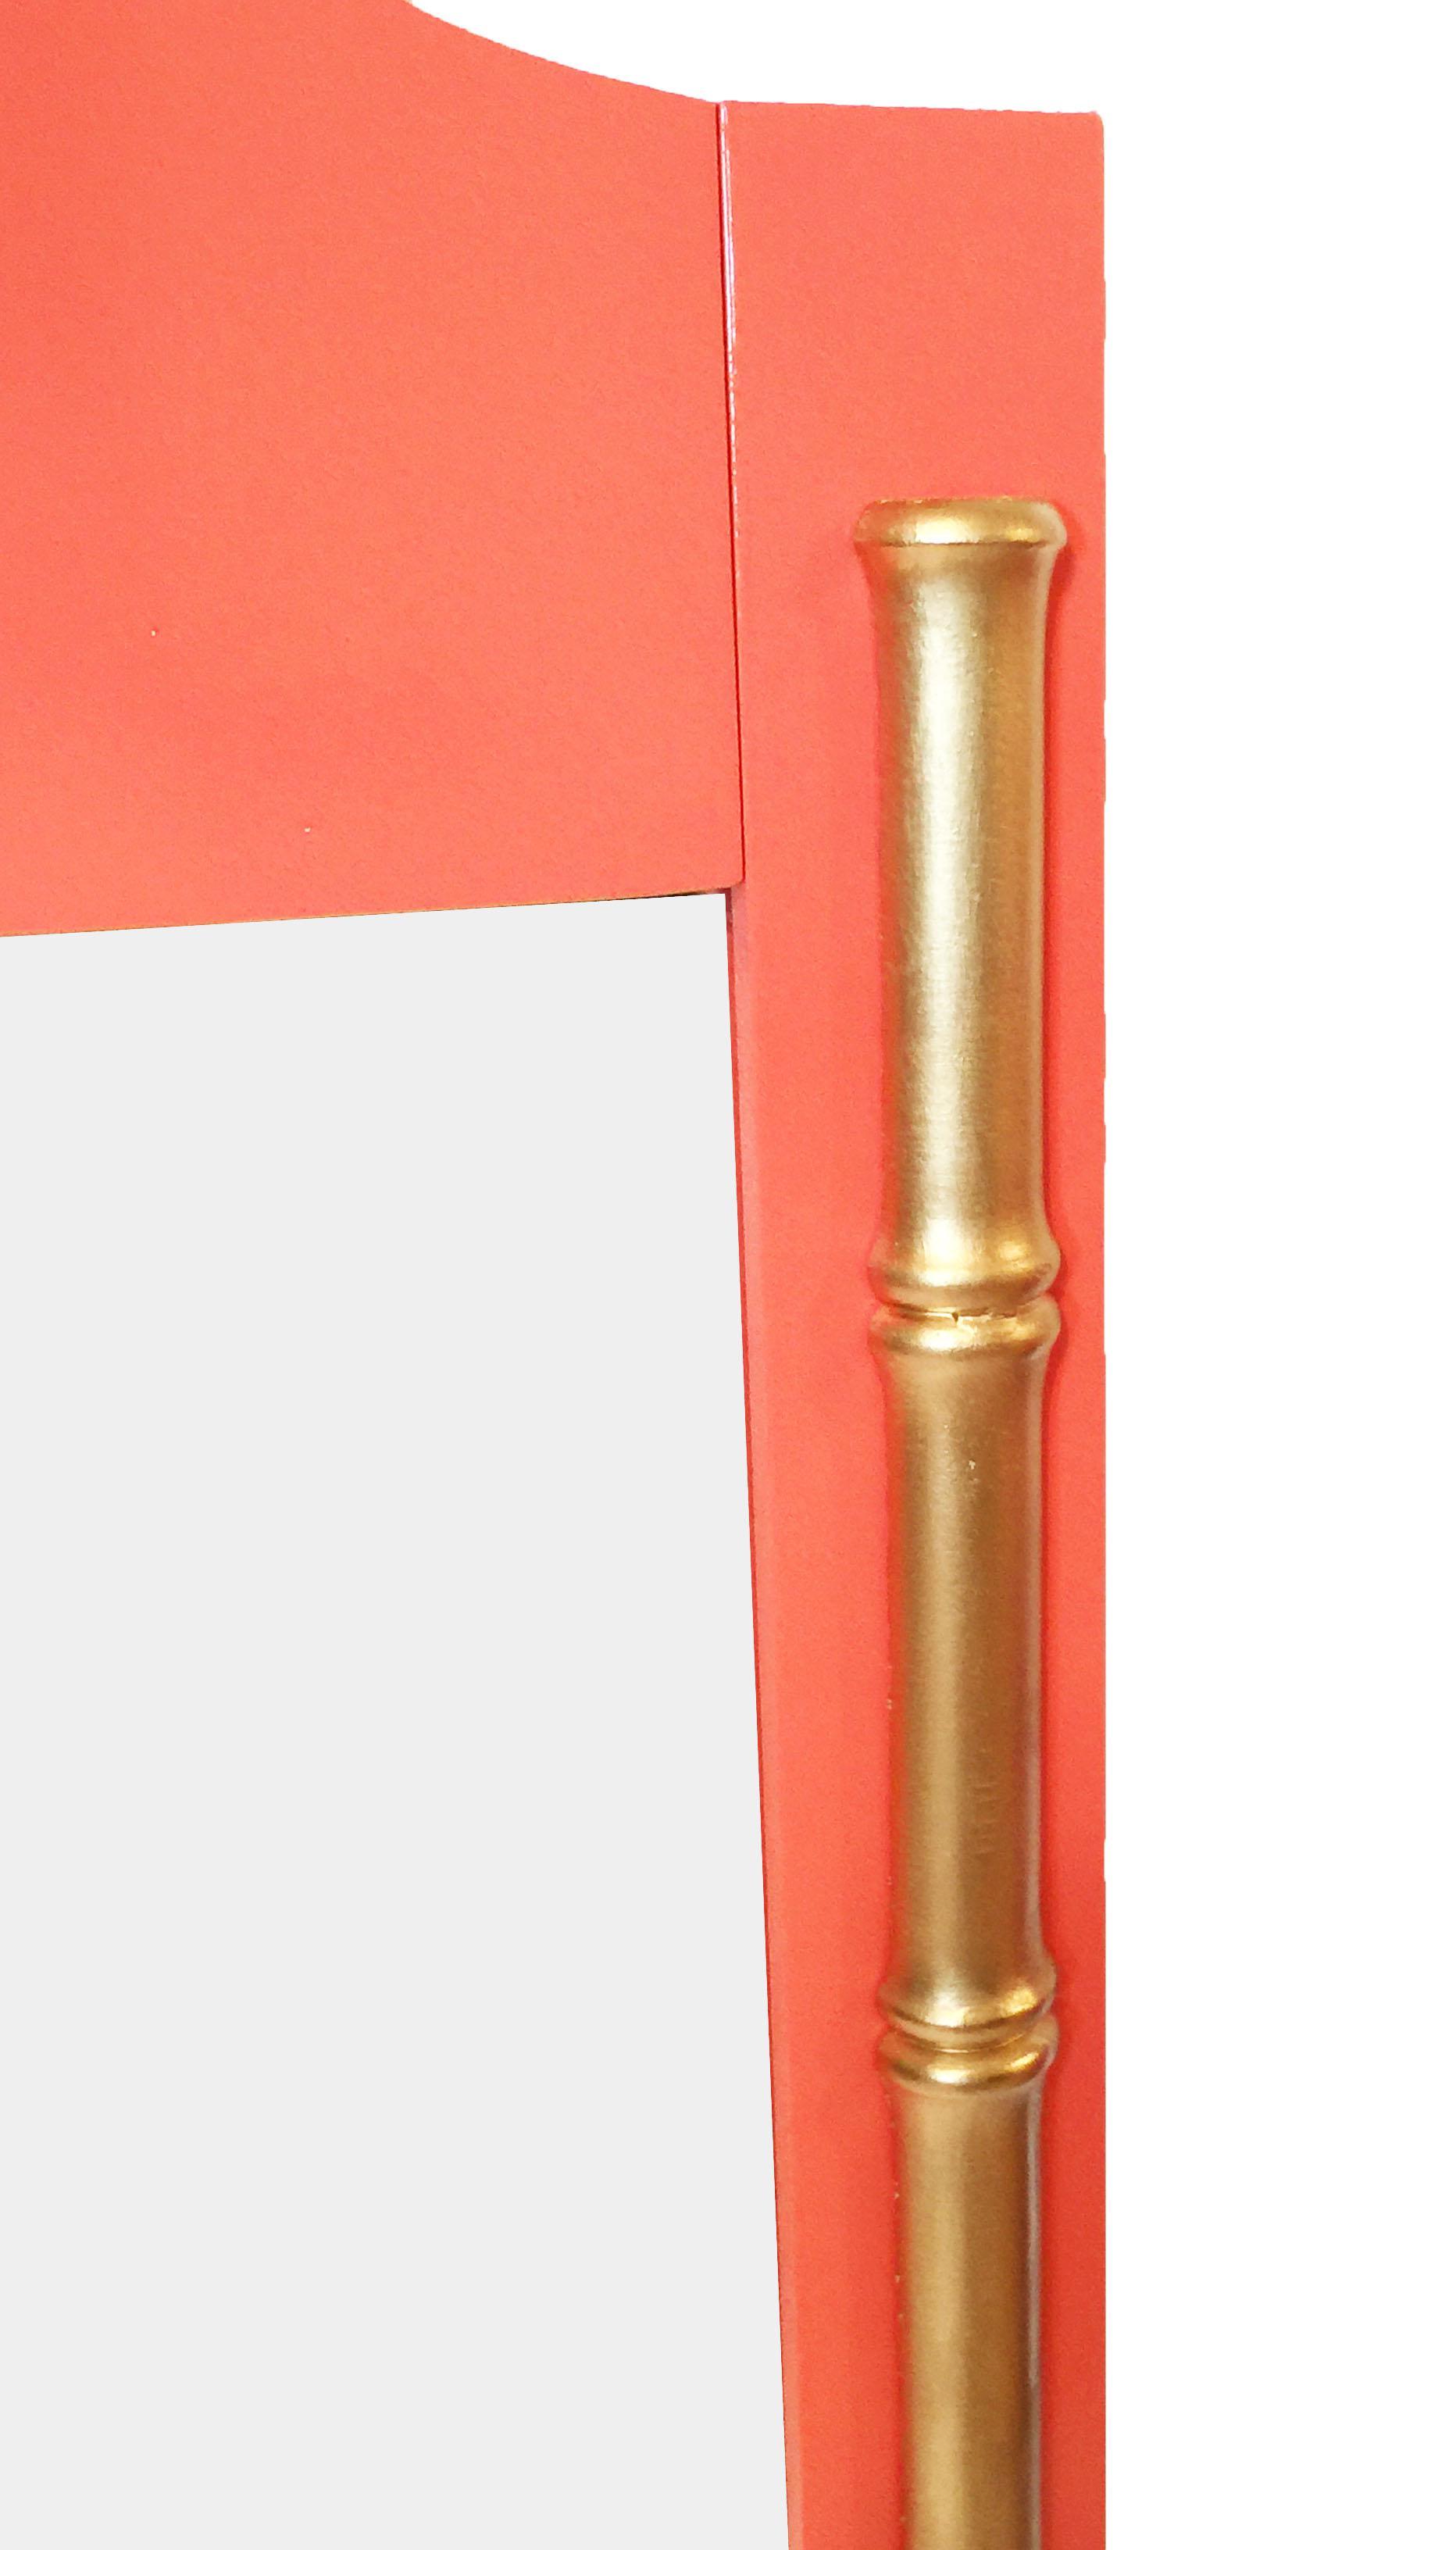 vintage-faux-bamboo-henry-link-bali-hai-dresser-9981?aspect=fit&width=640&height=640?resize=91,91 Henry Link Bali Hai